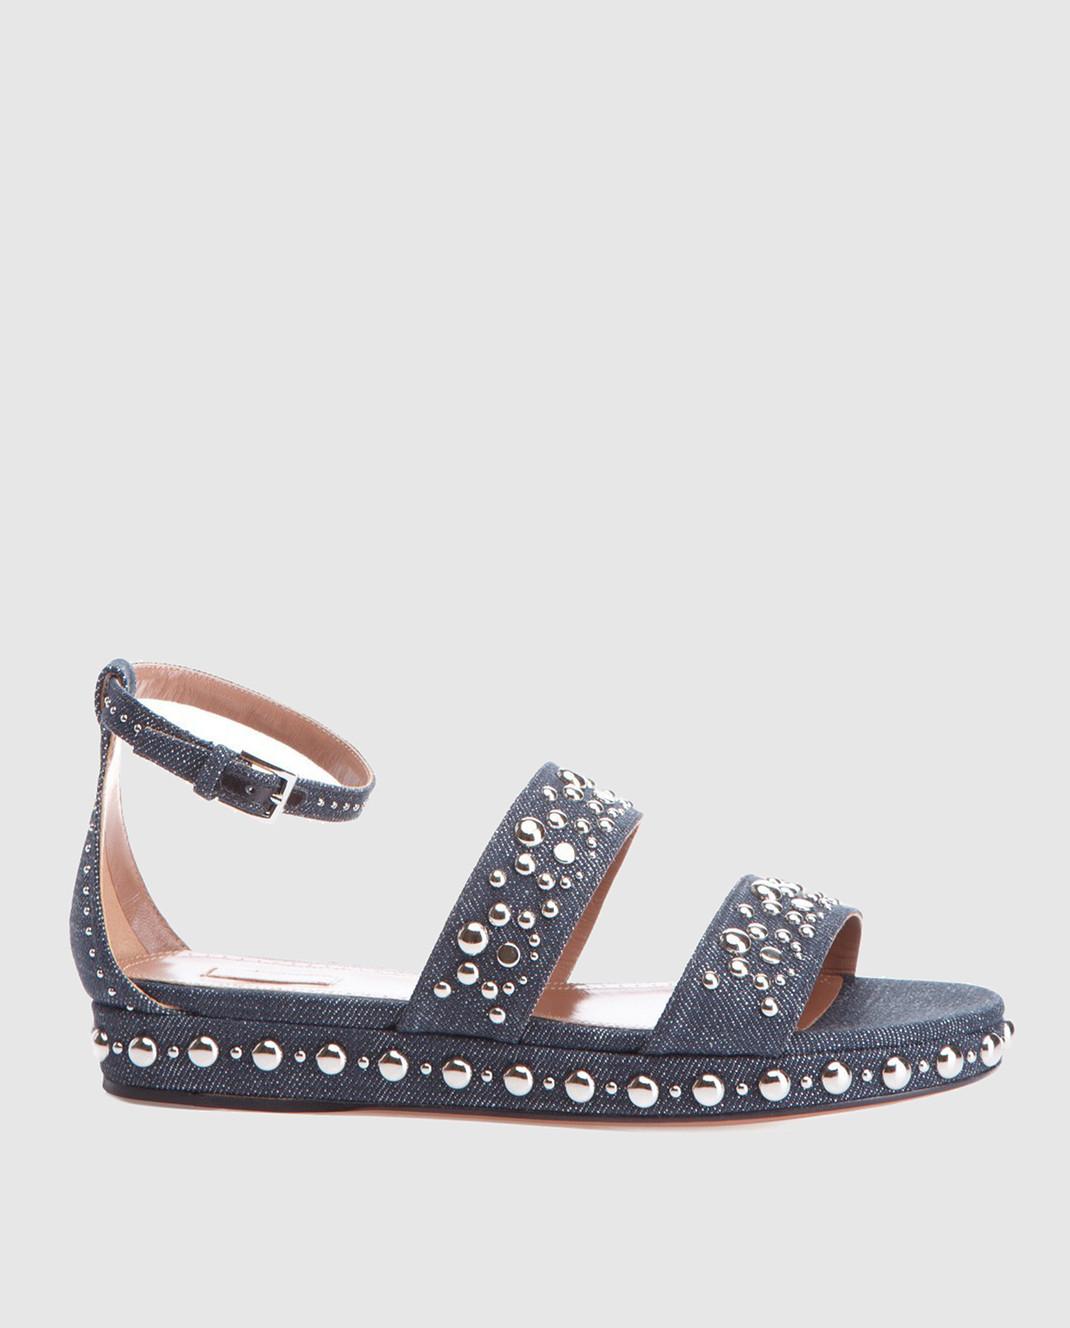 Azzedine Alaia Синие сандалии изображение 1